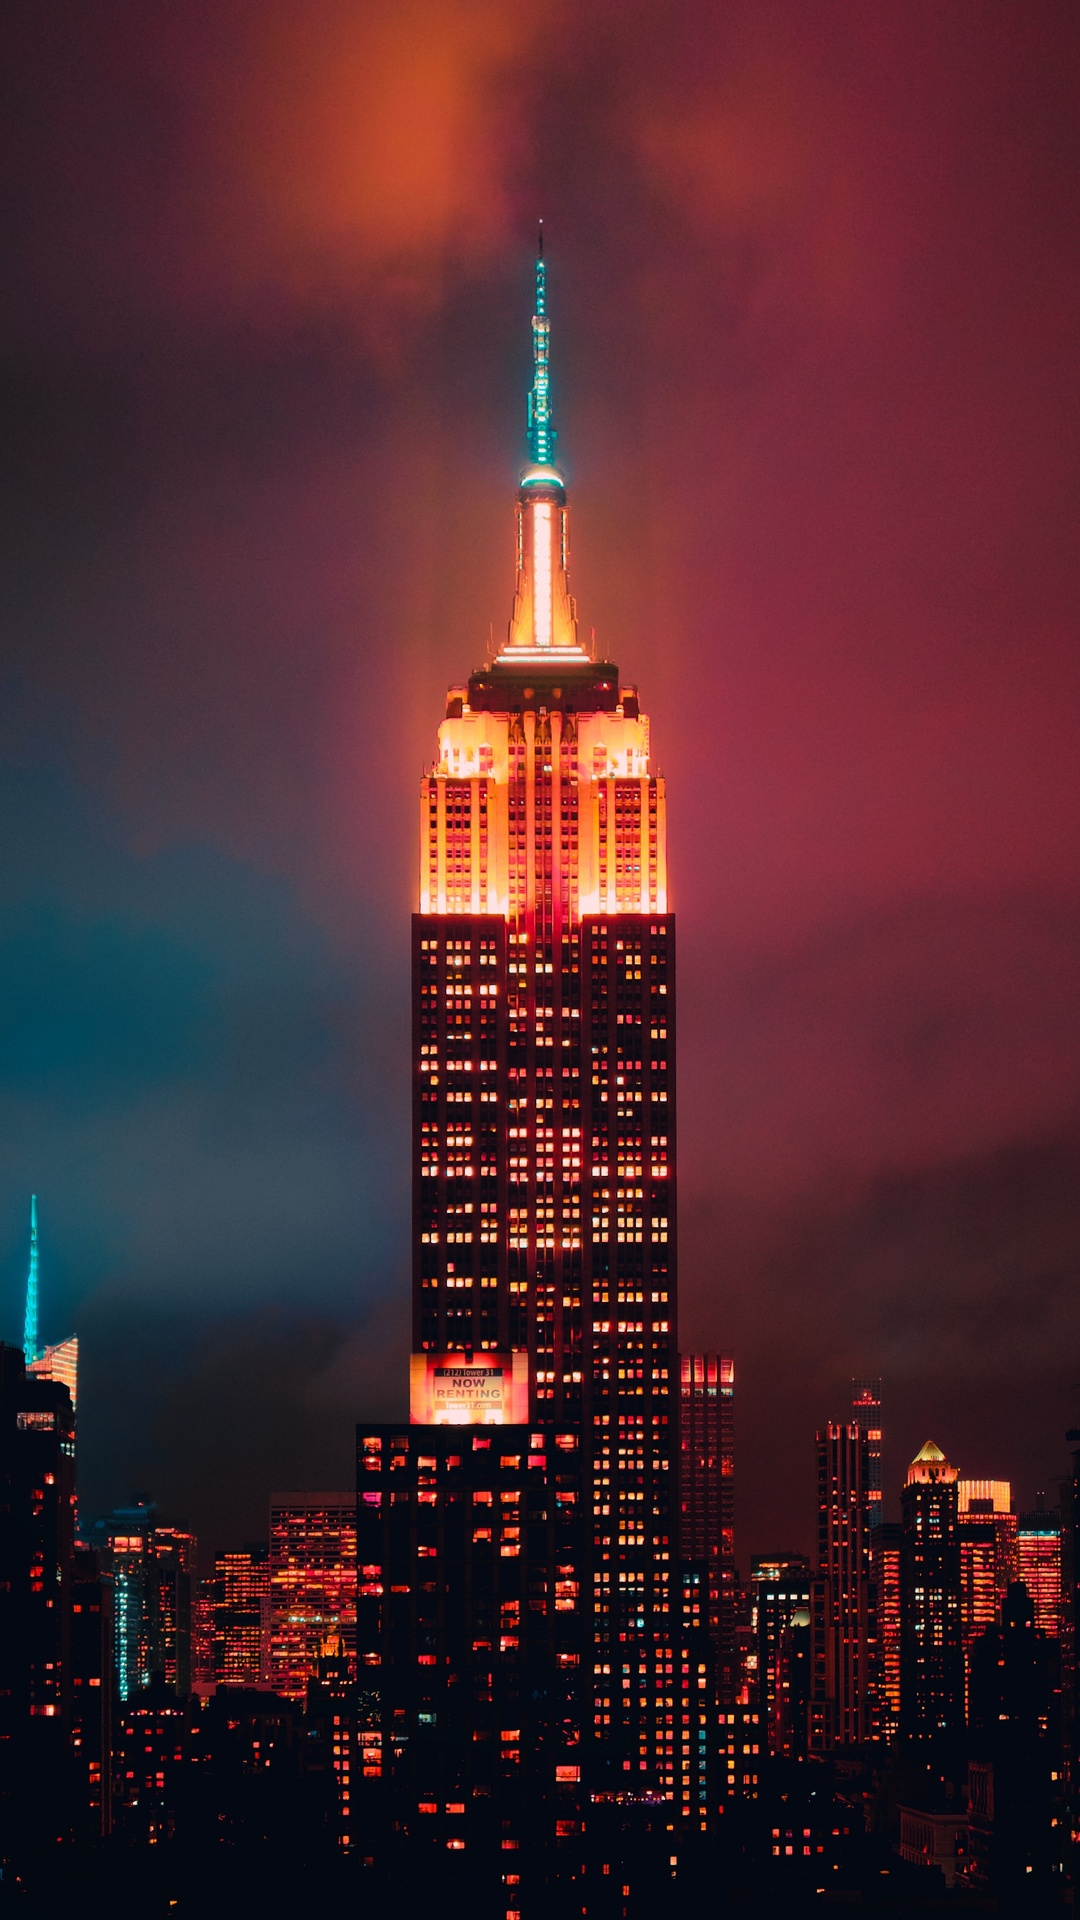 empire-state-building-night-5k-oa.jpg